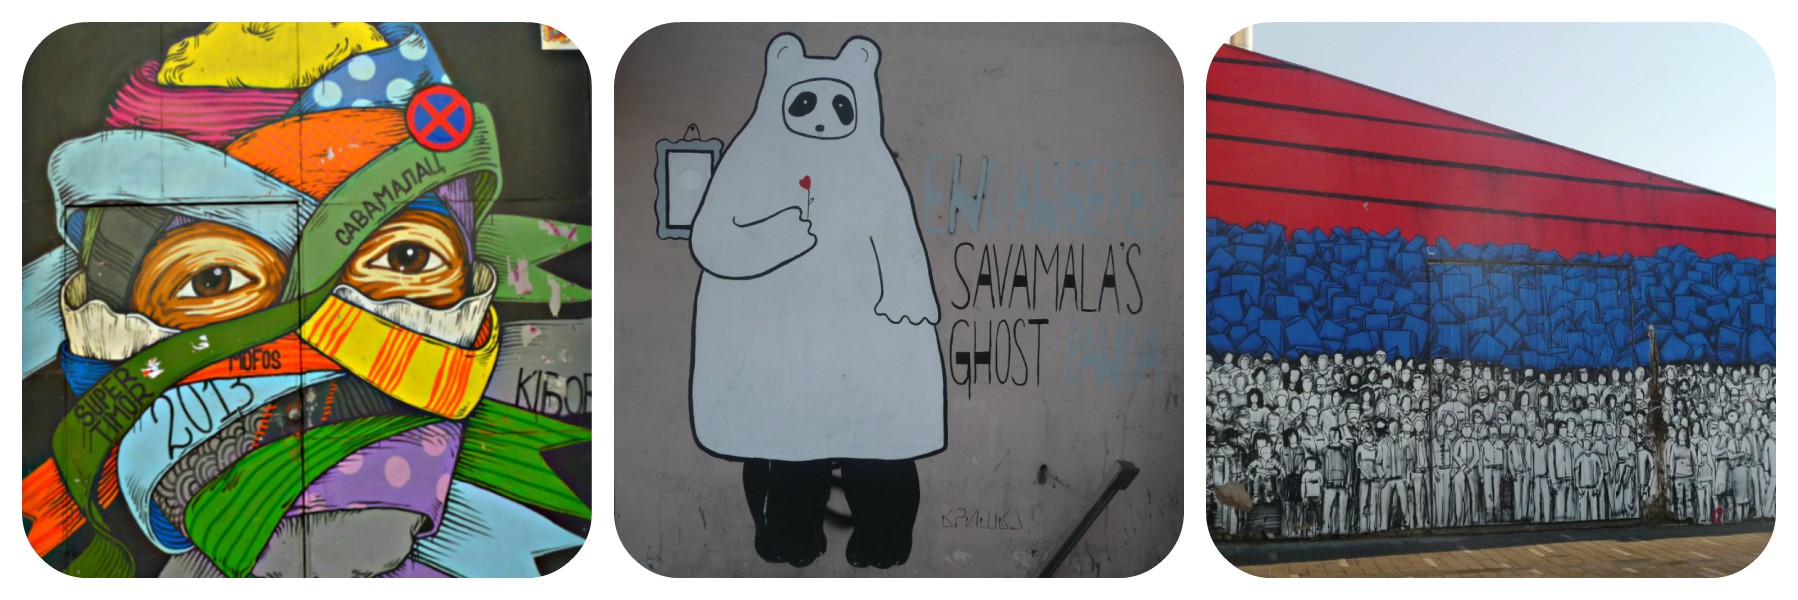 Savamala grafiti 19